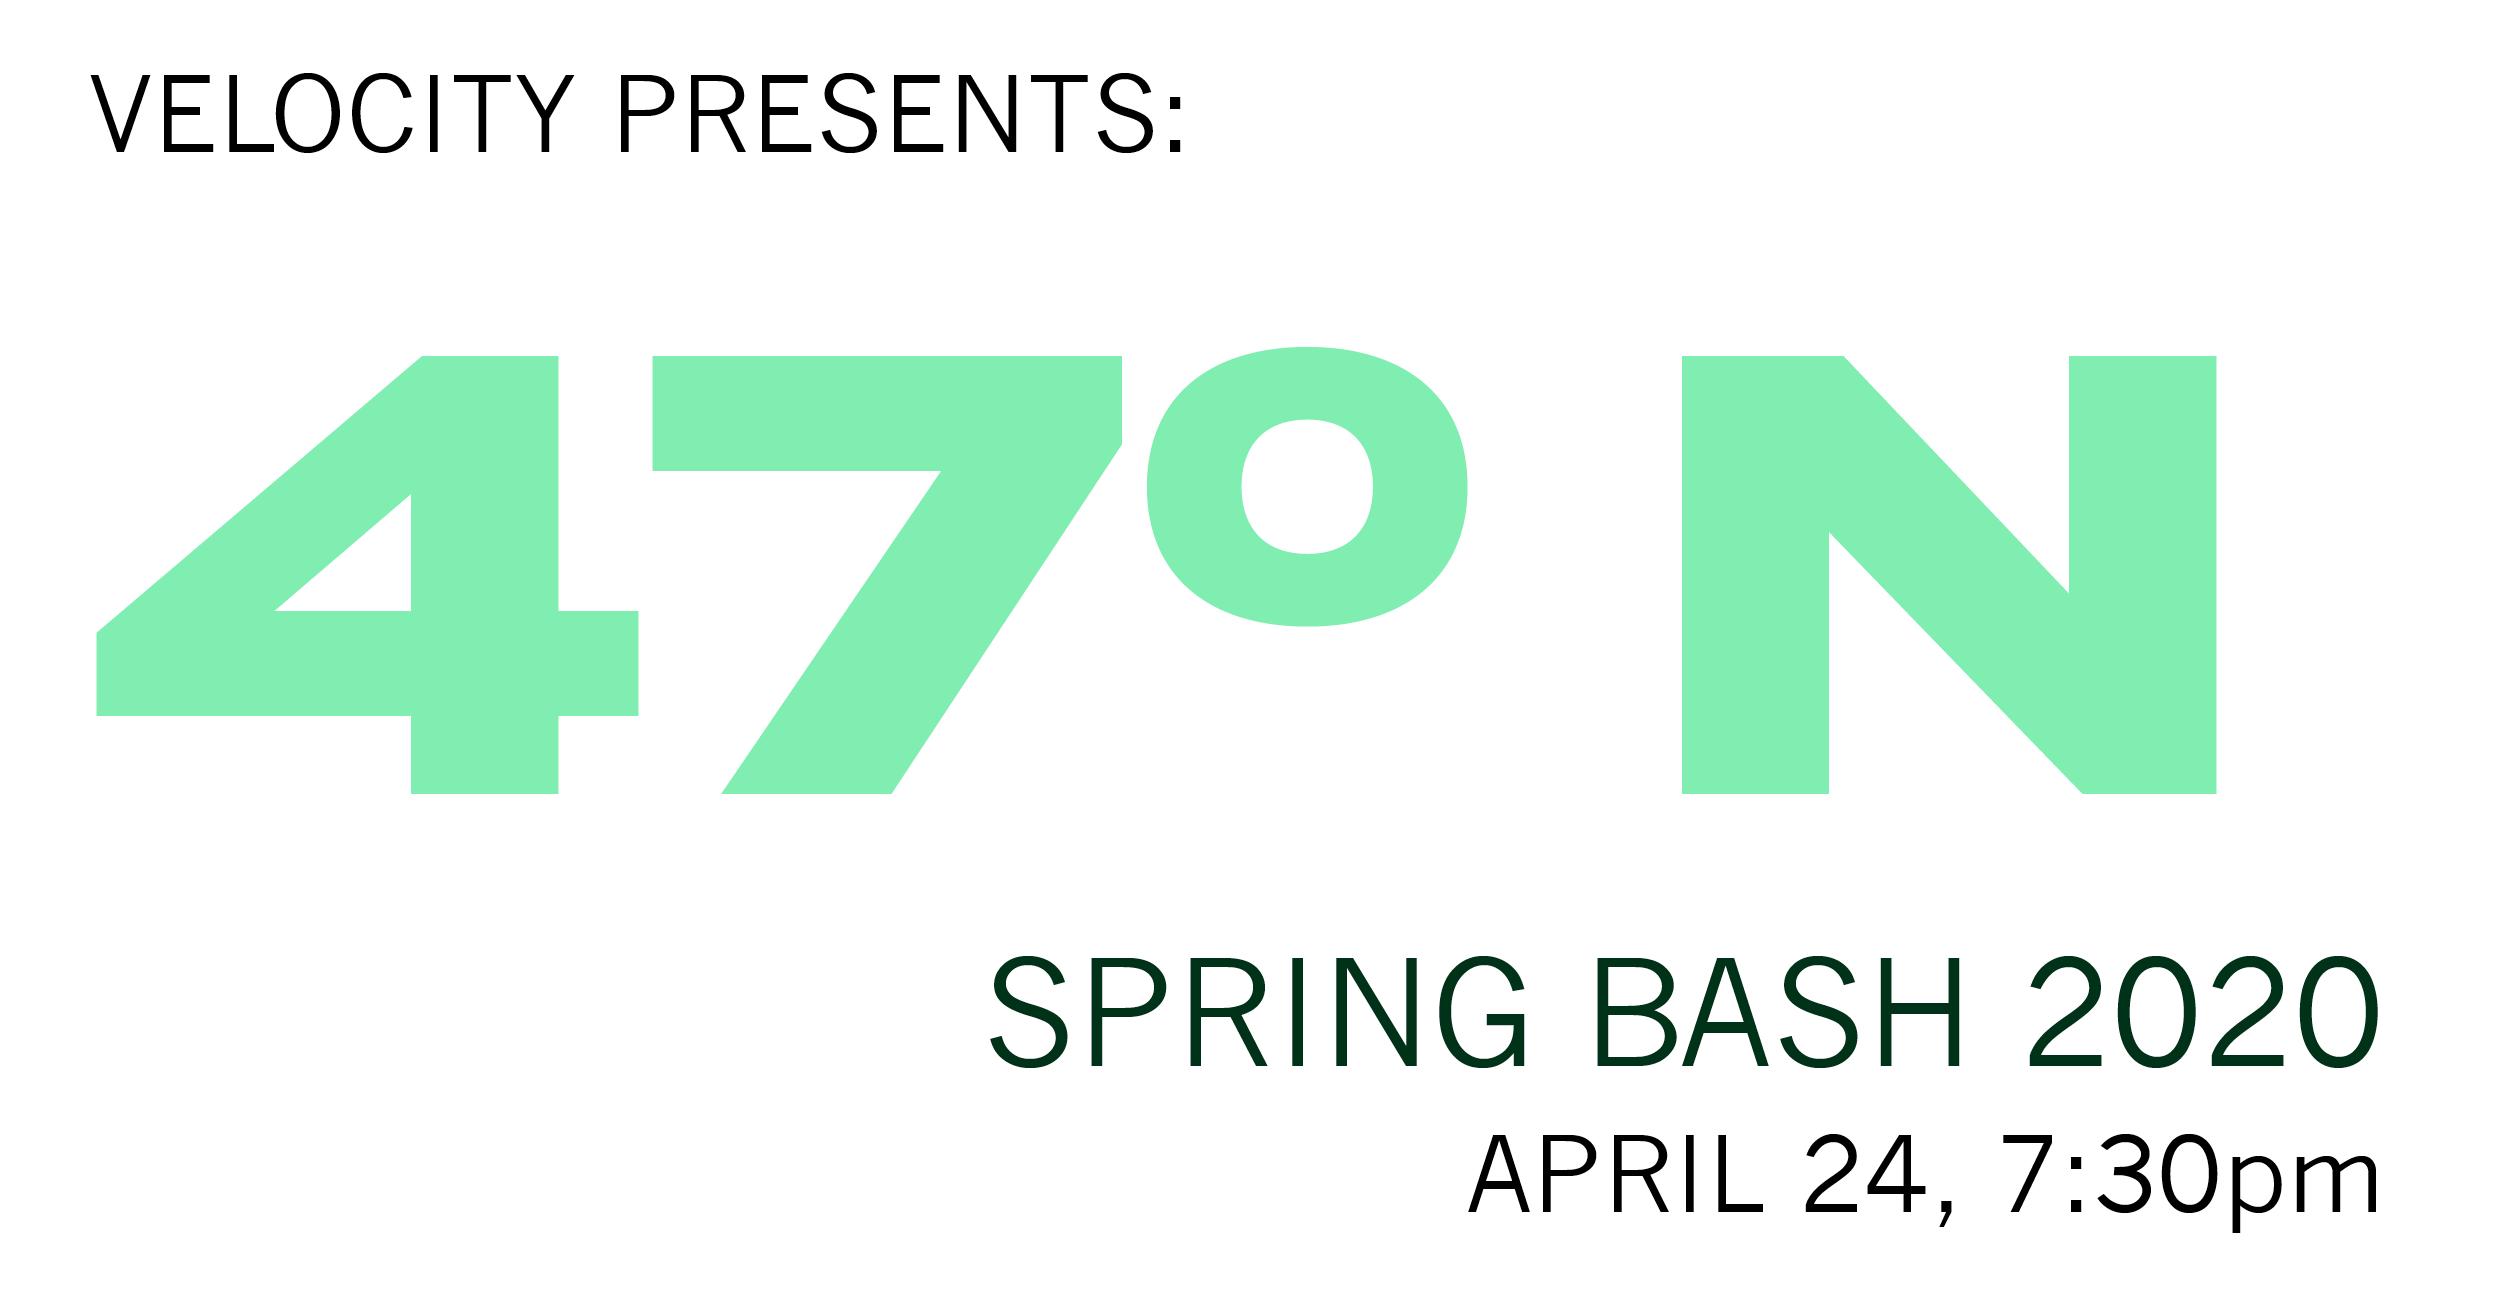 Spring Bash 2020